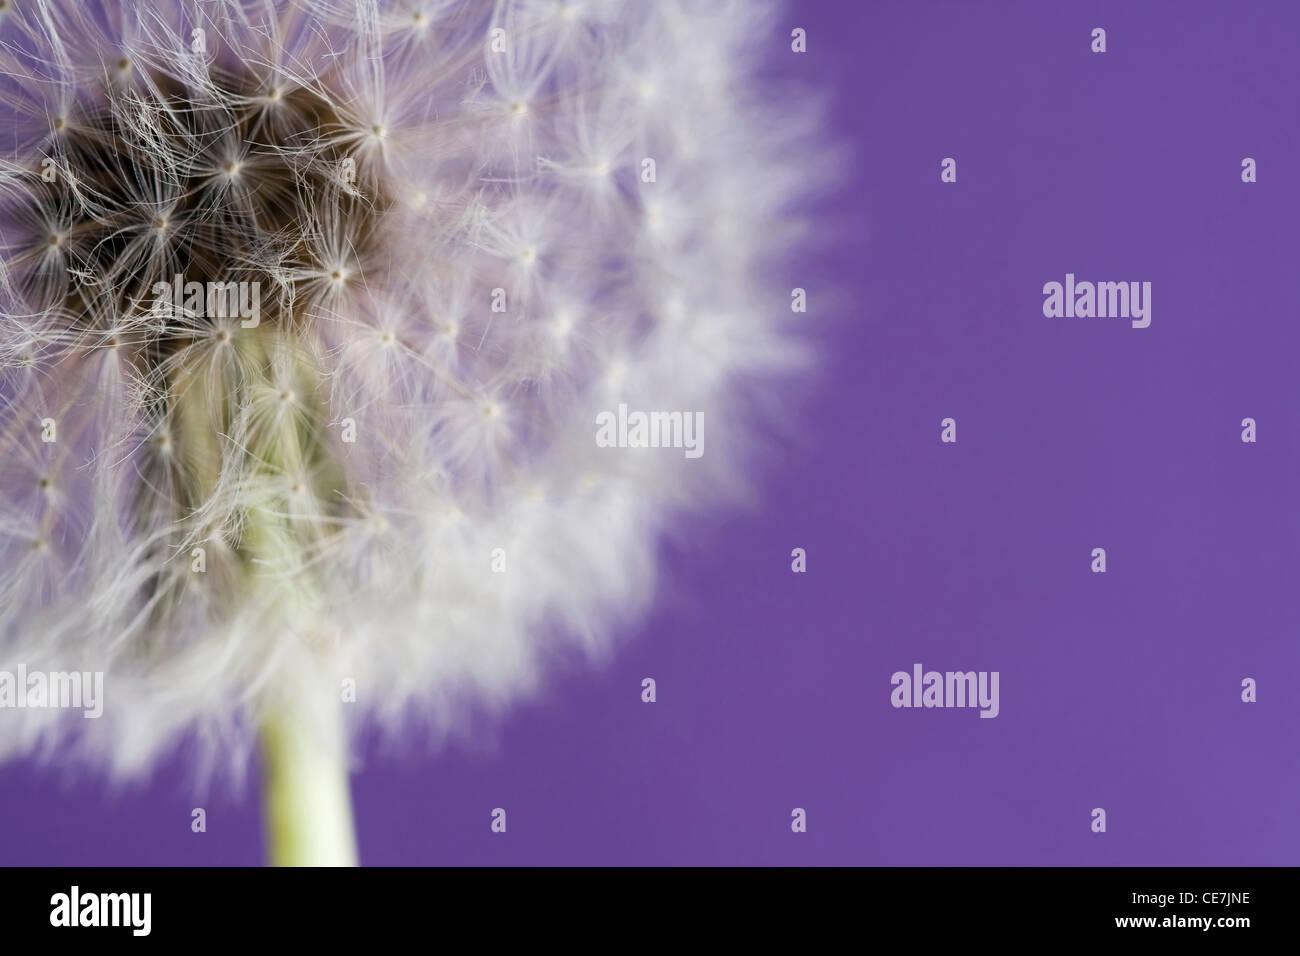 Dandelion clock, Taraxacum officinale, White, Purple. Stock Photo